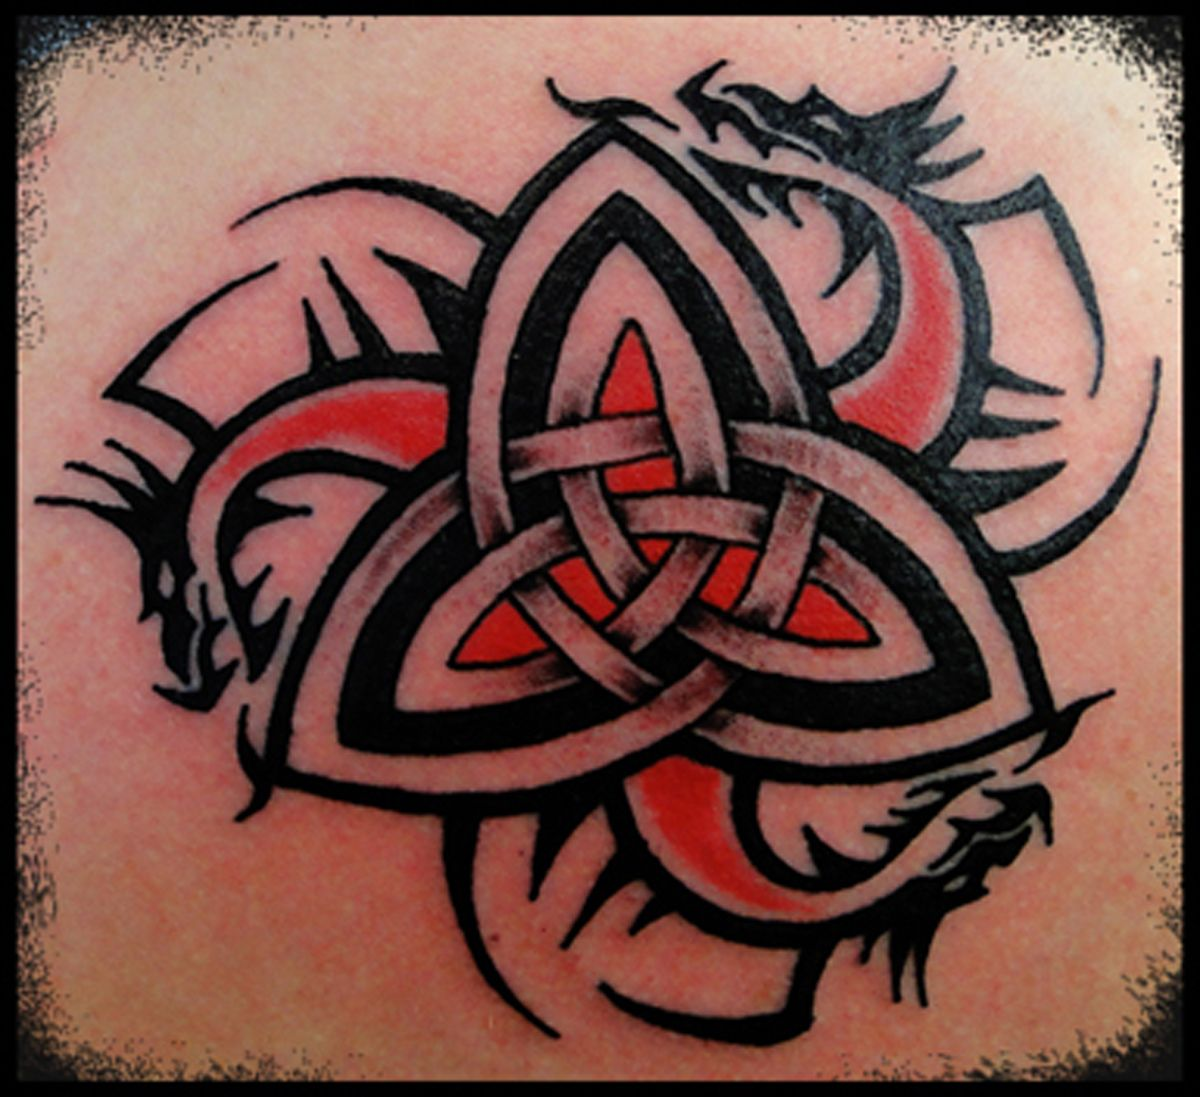 tattoo celtic dragons trinity knot viking nordic pagan druid dragon tattoos pinterest. Black Bedroom Furniture Sets. Home Design Ideas